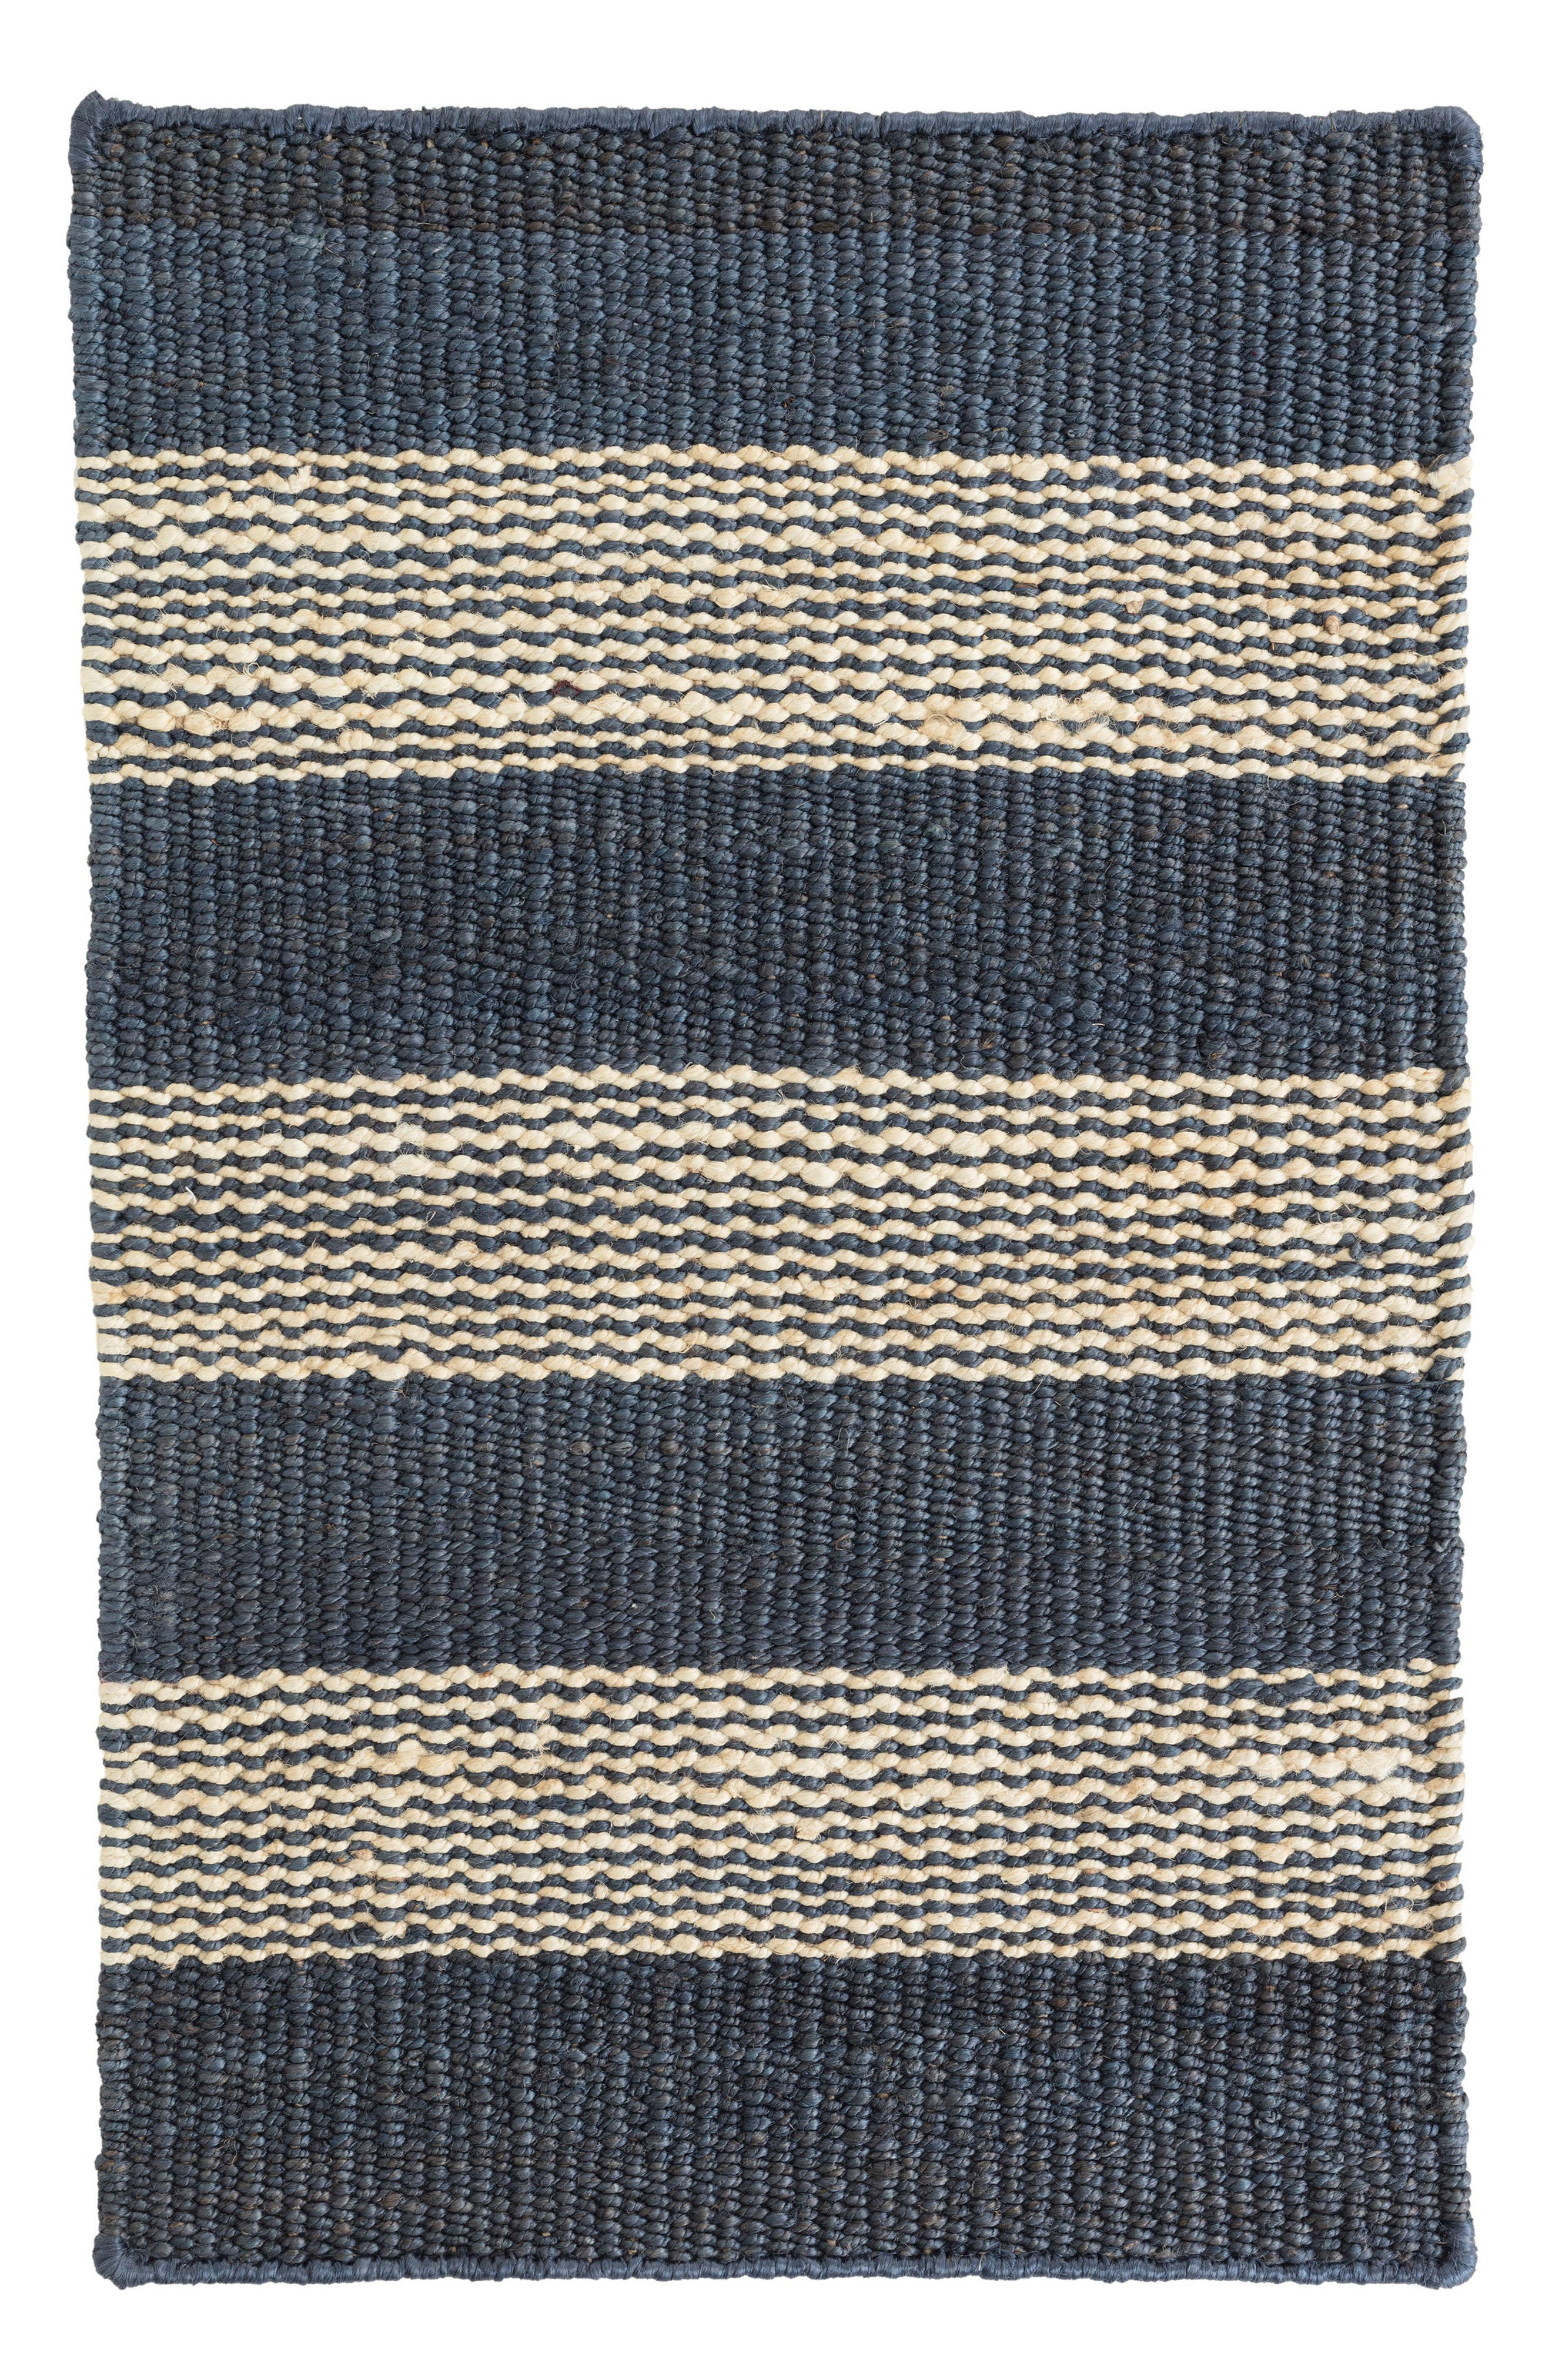 Denim Ticking Woven Rug,                         Main,                         color, BLUE